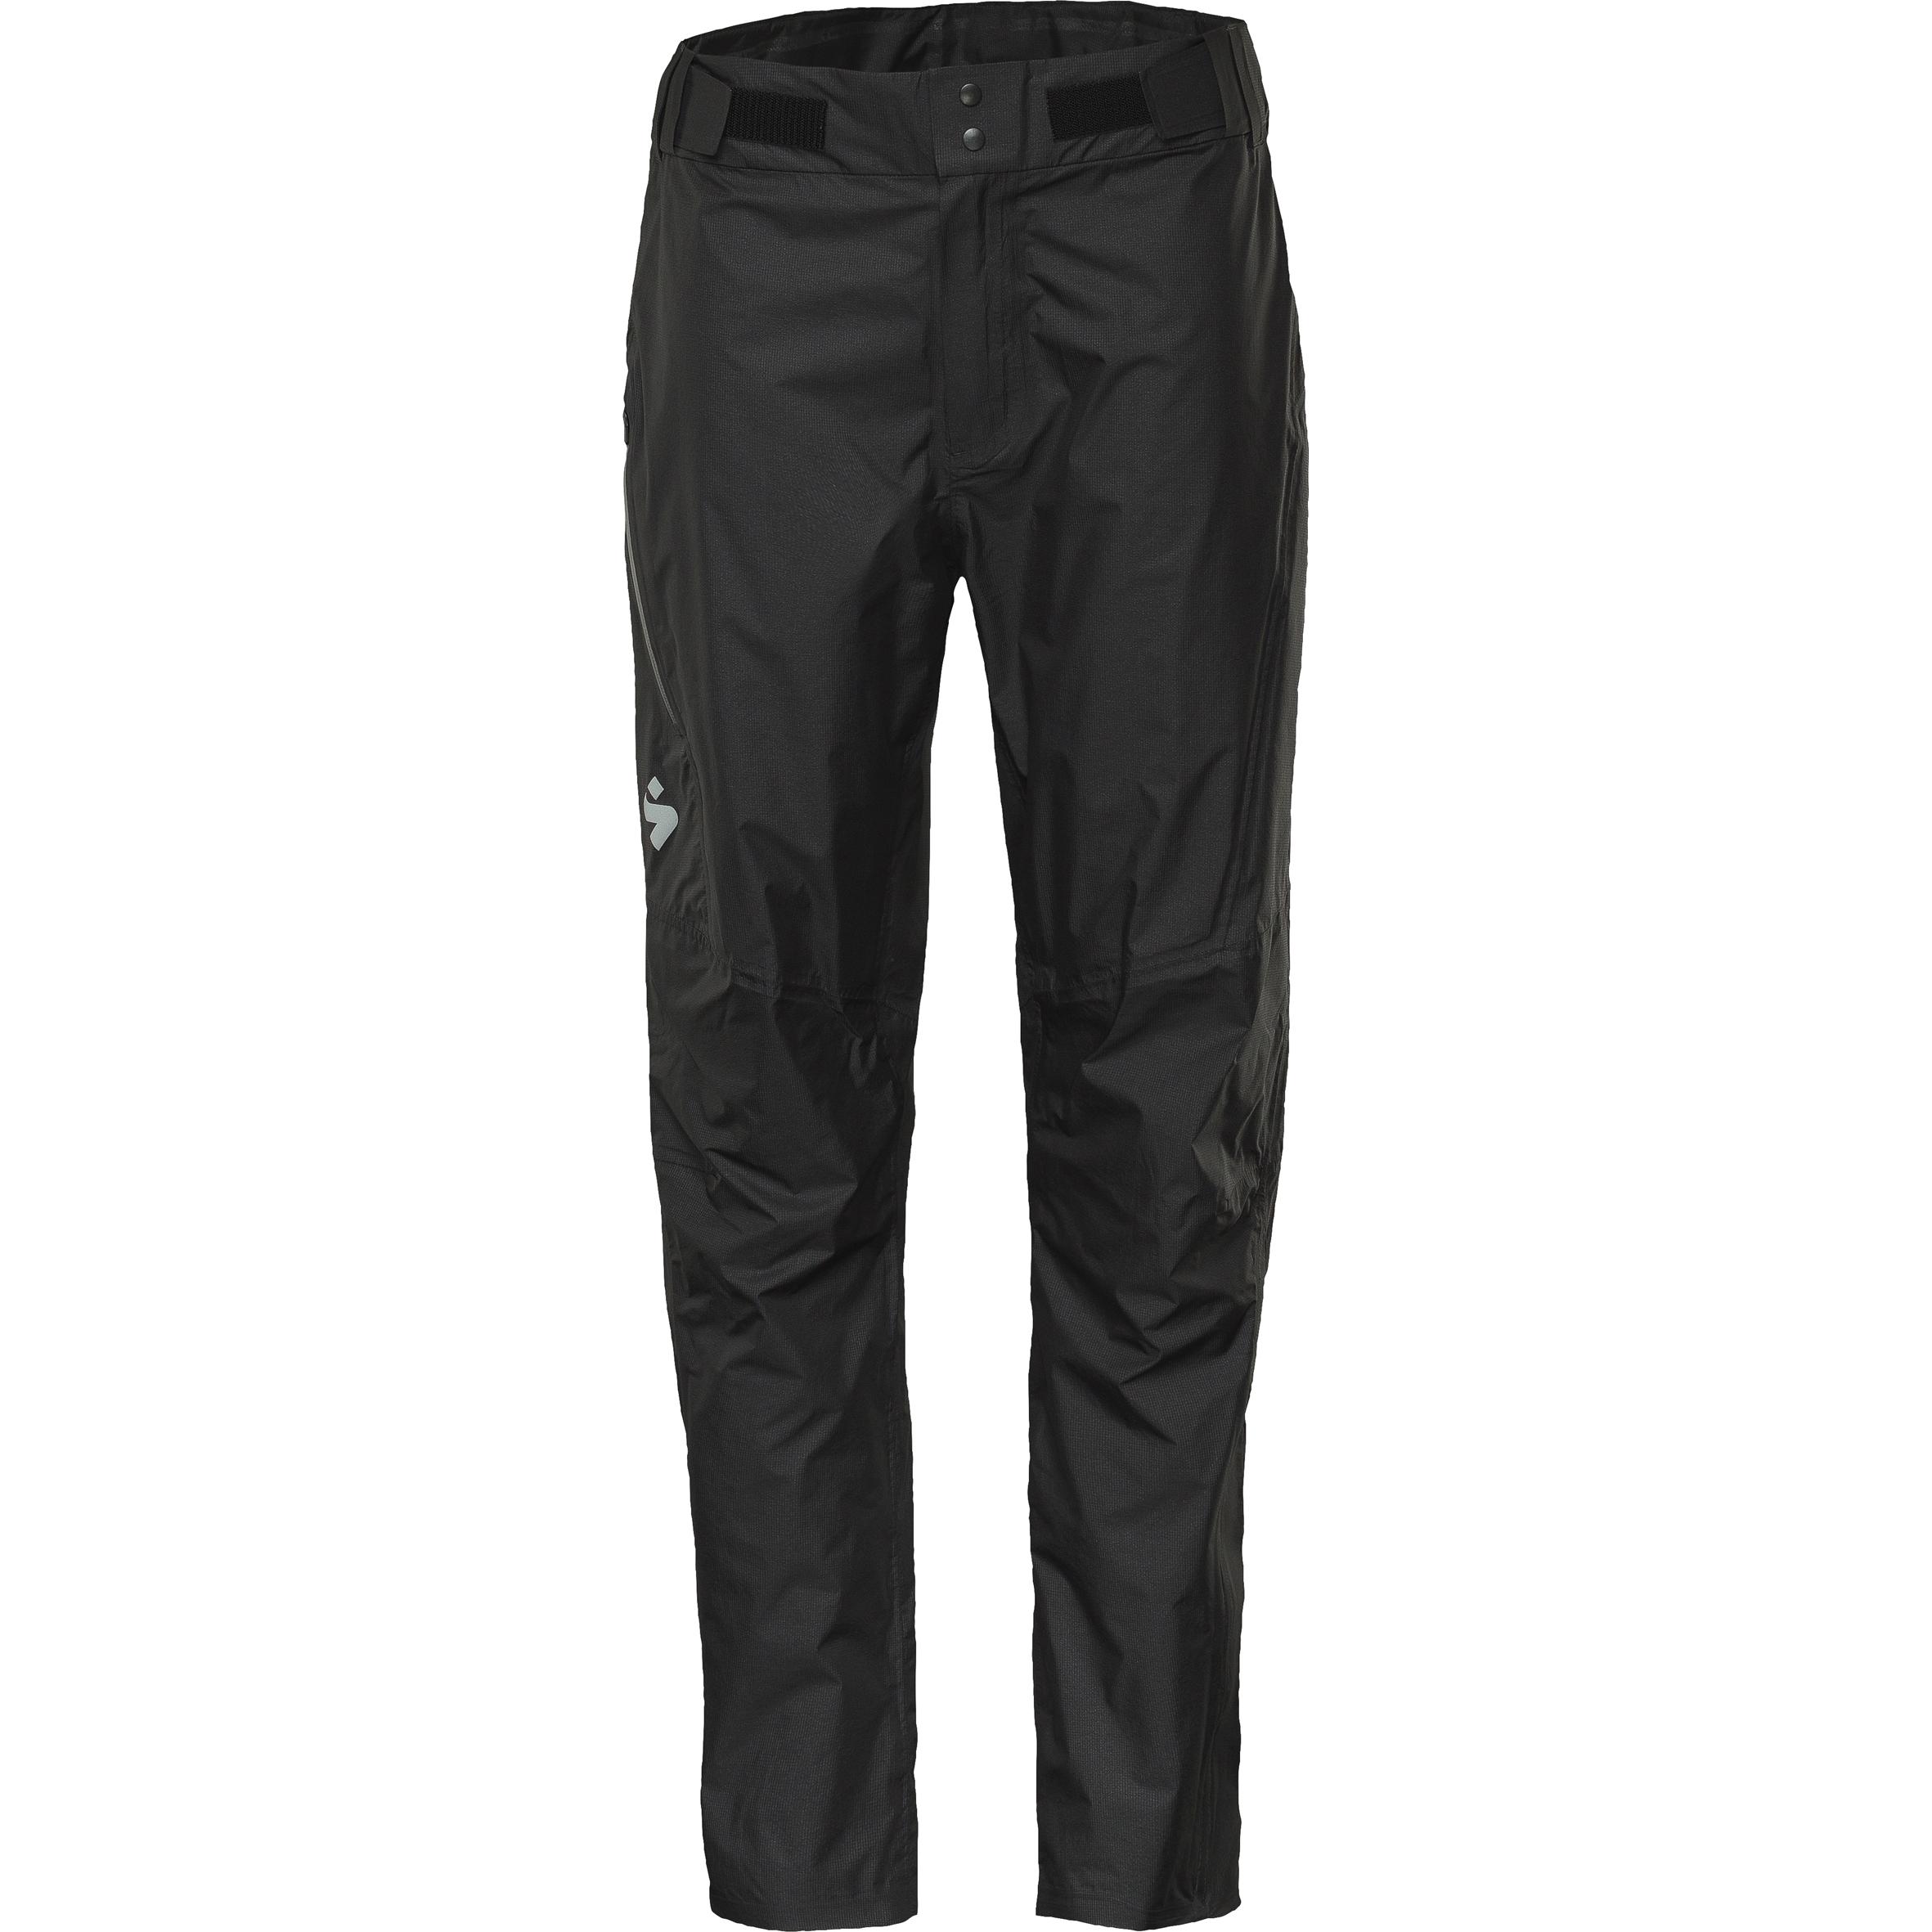 Braasport Sweet Protection Hunter DryZeal Pant sykkelbukse